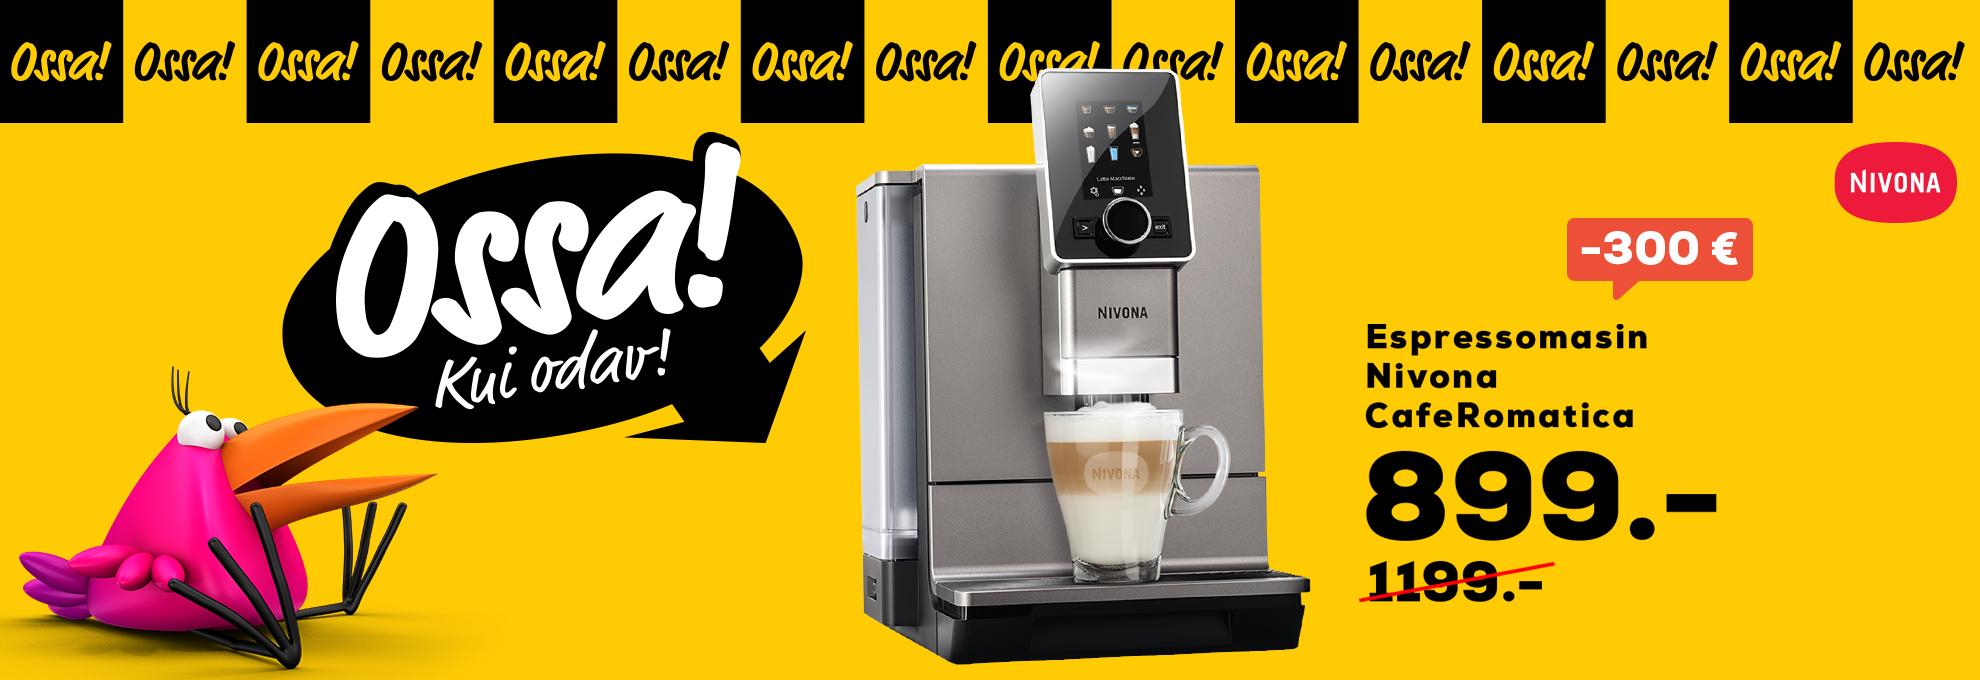 Ossa! Nivona Cafe Romantica 930